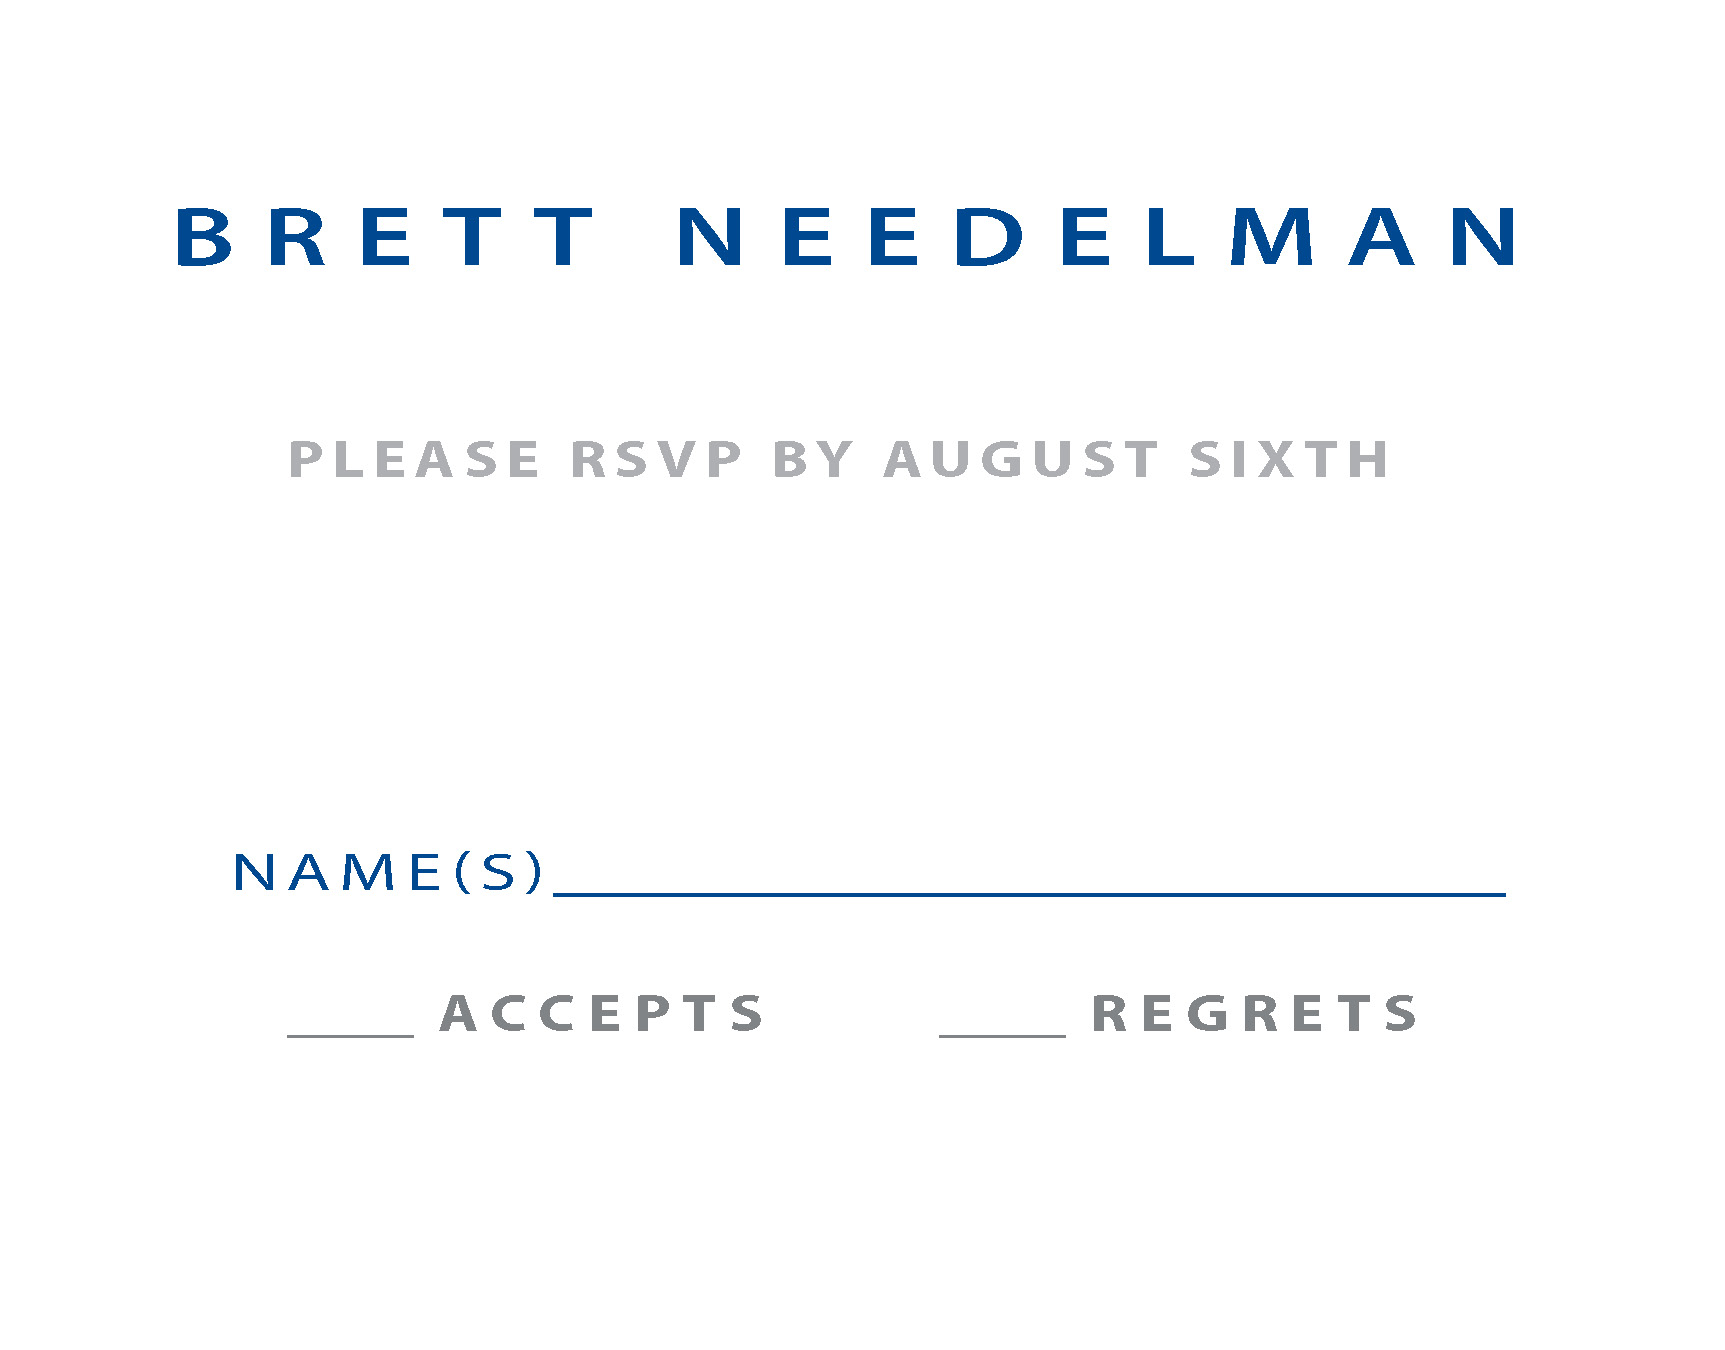 Needleman, BRETTFINAL_Page_3.jpg